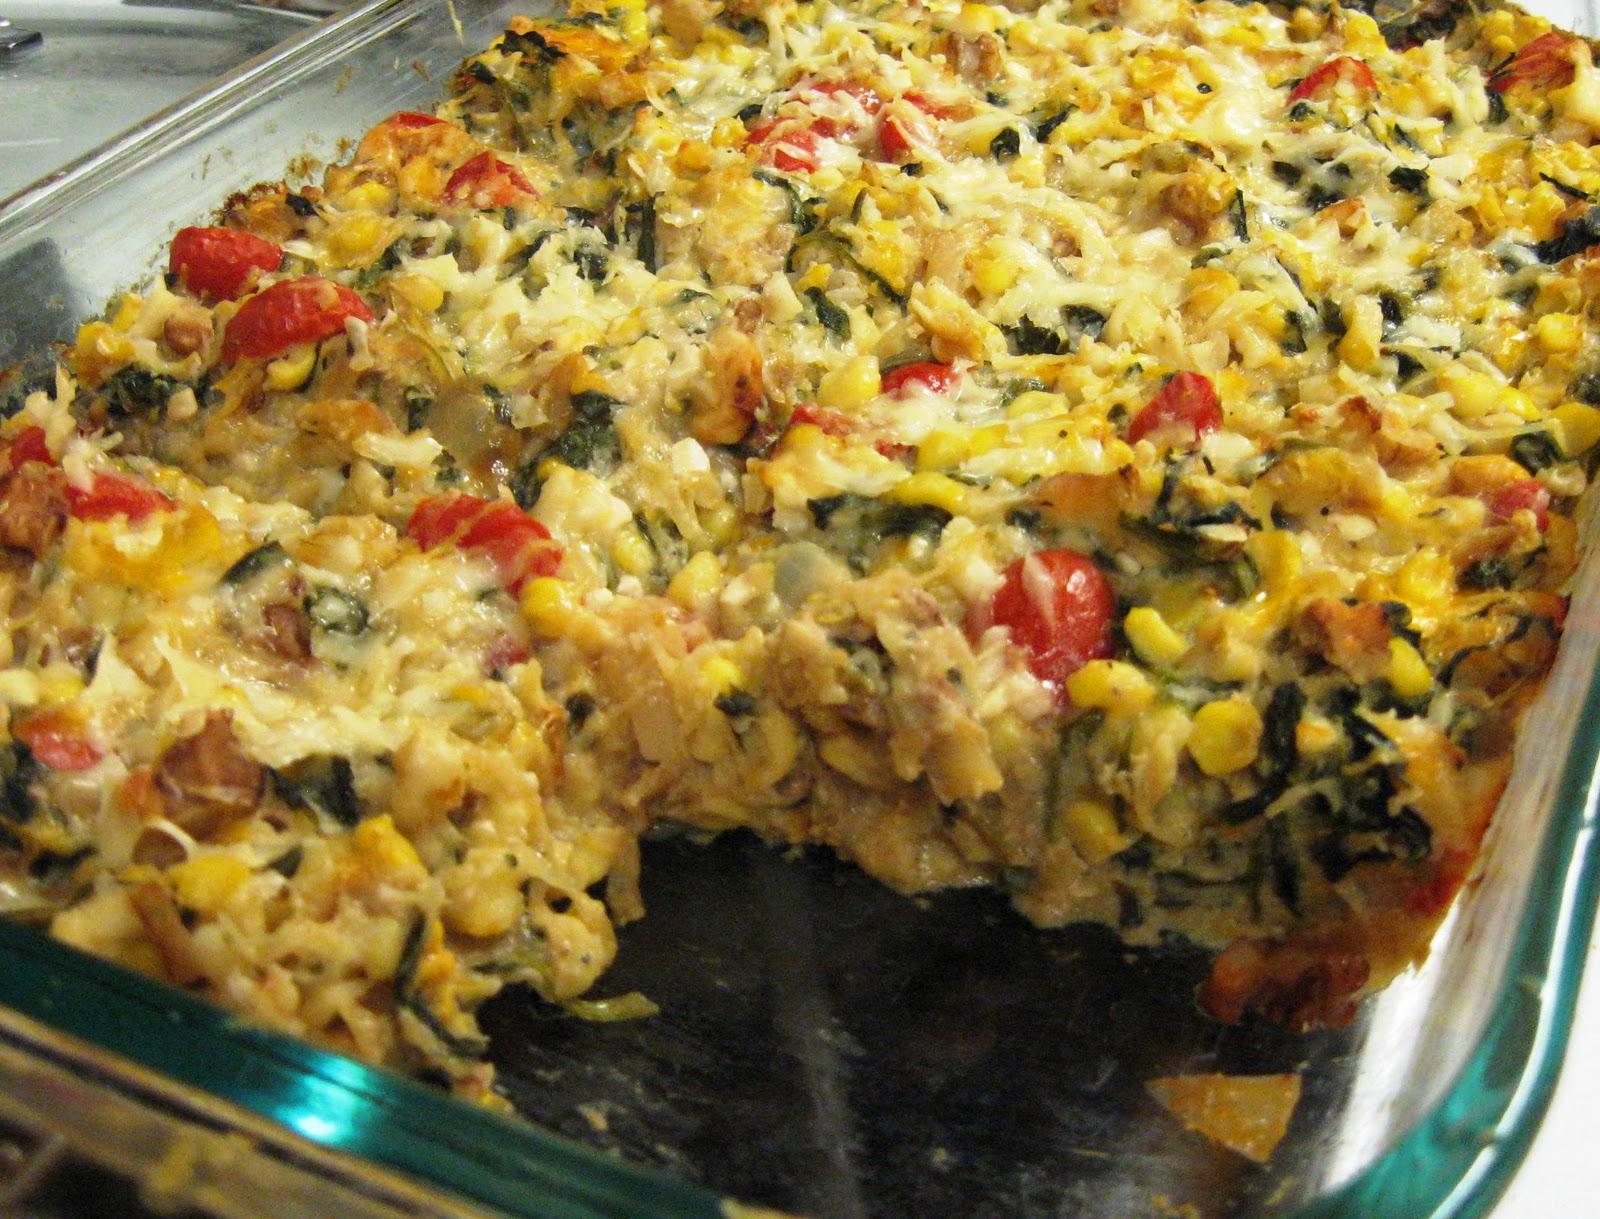 Debbi Does Dinner... Healthy & Low Calorie: Spaghetti Squash Gratin